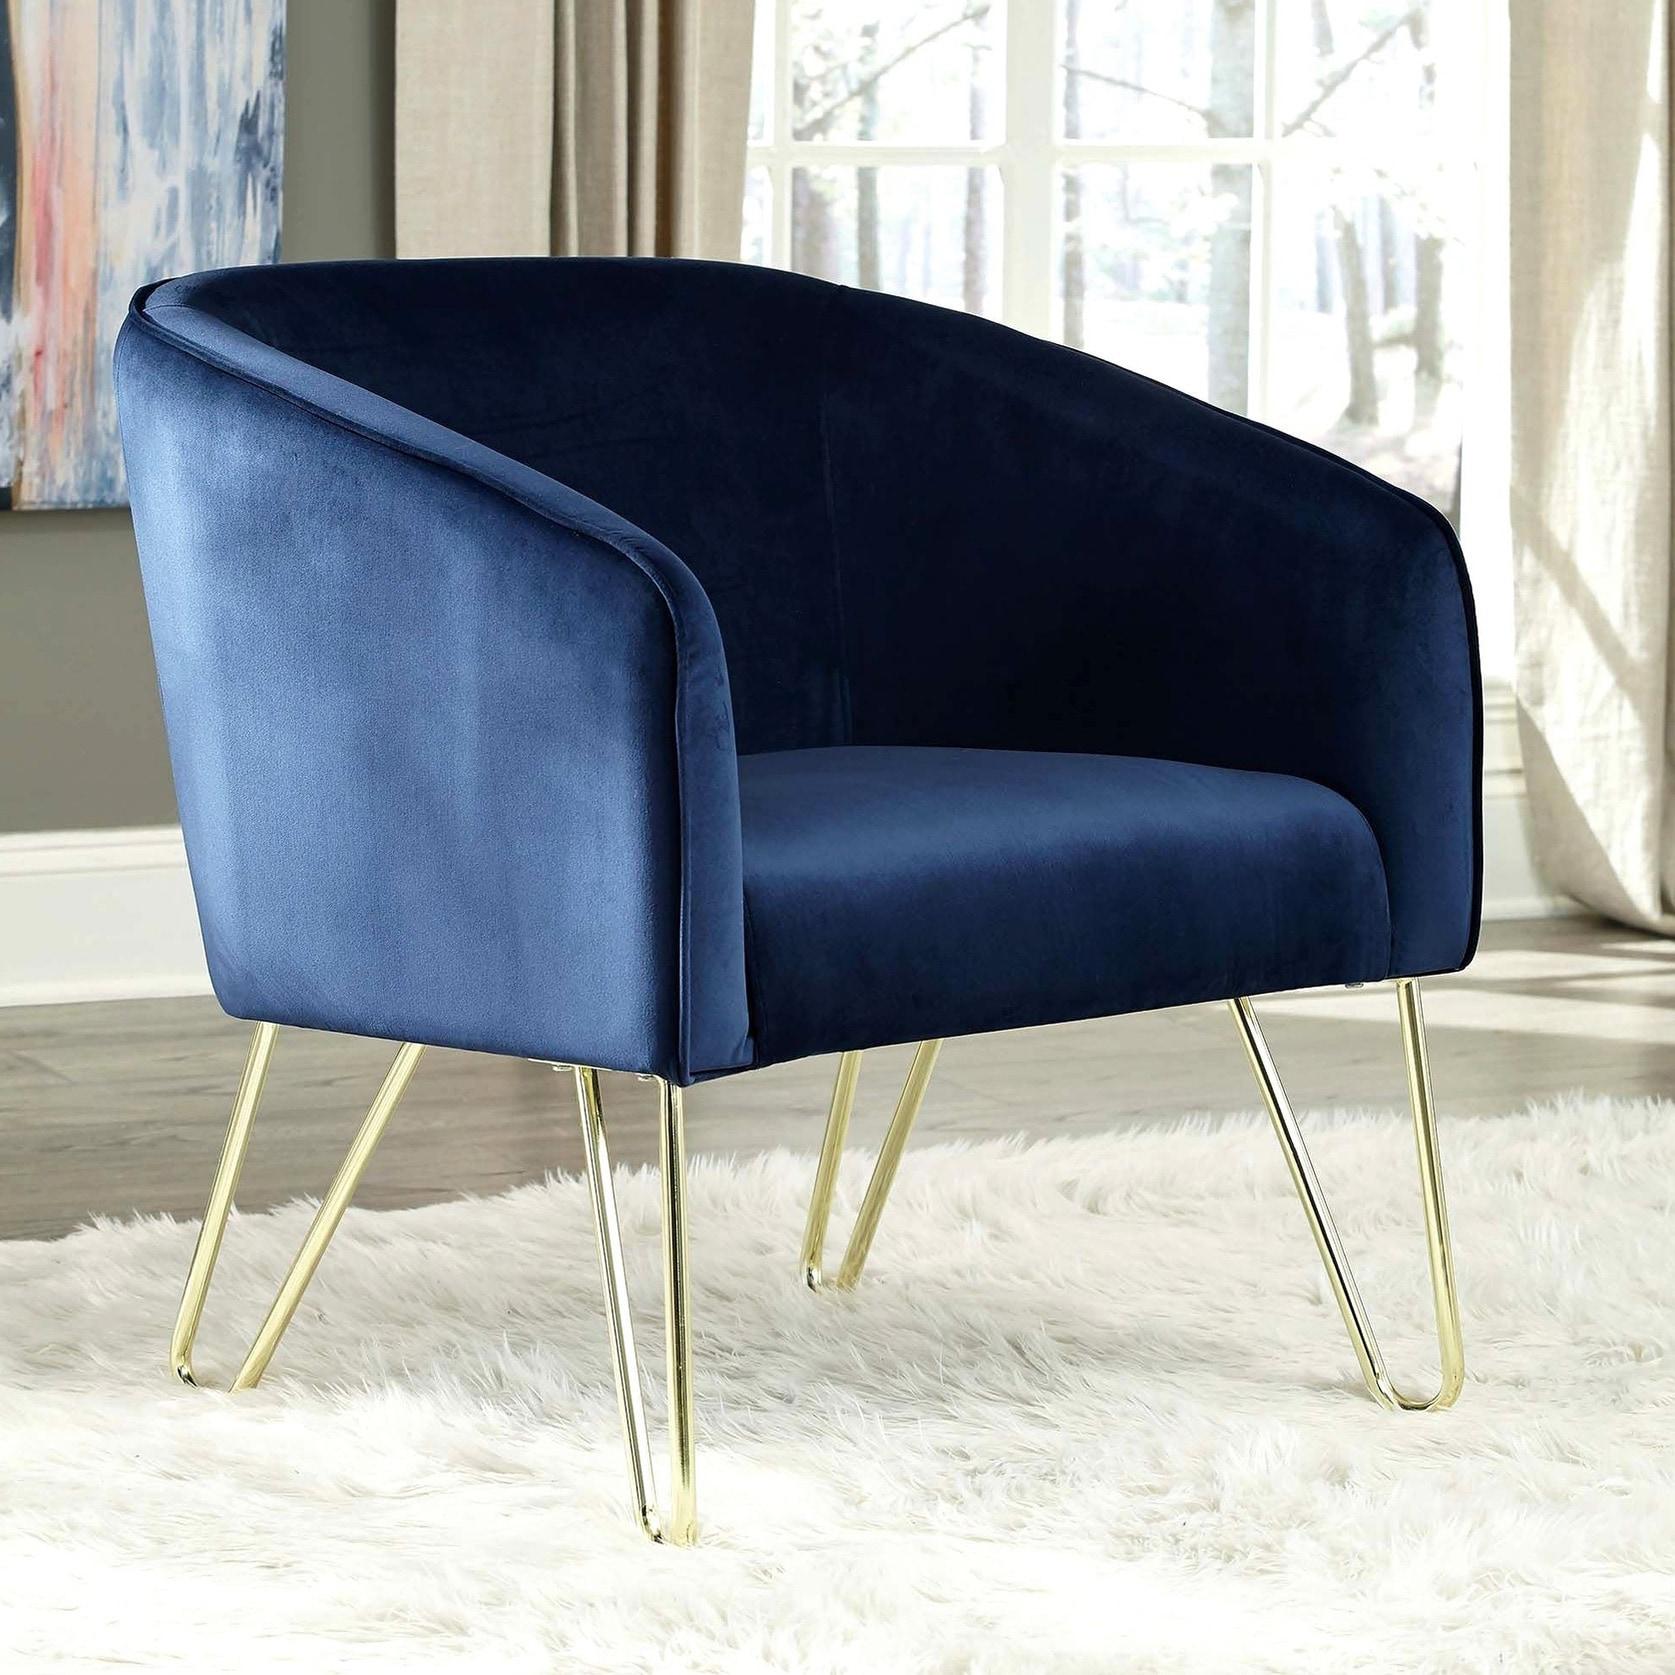 Modern Design Blue Velvet Living Room Accent Chair With Brass Hairpin Legs